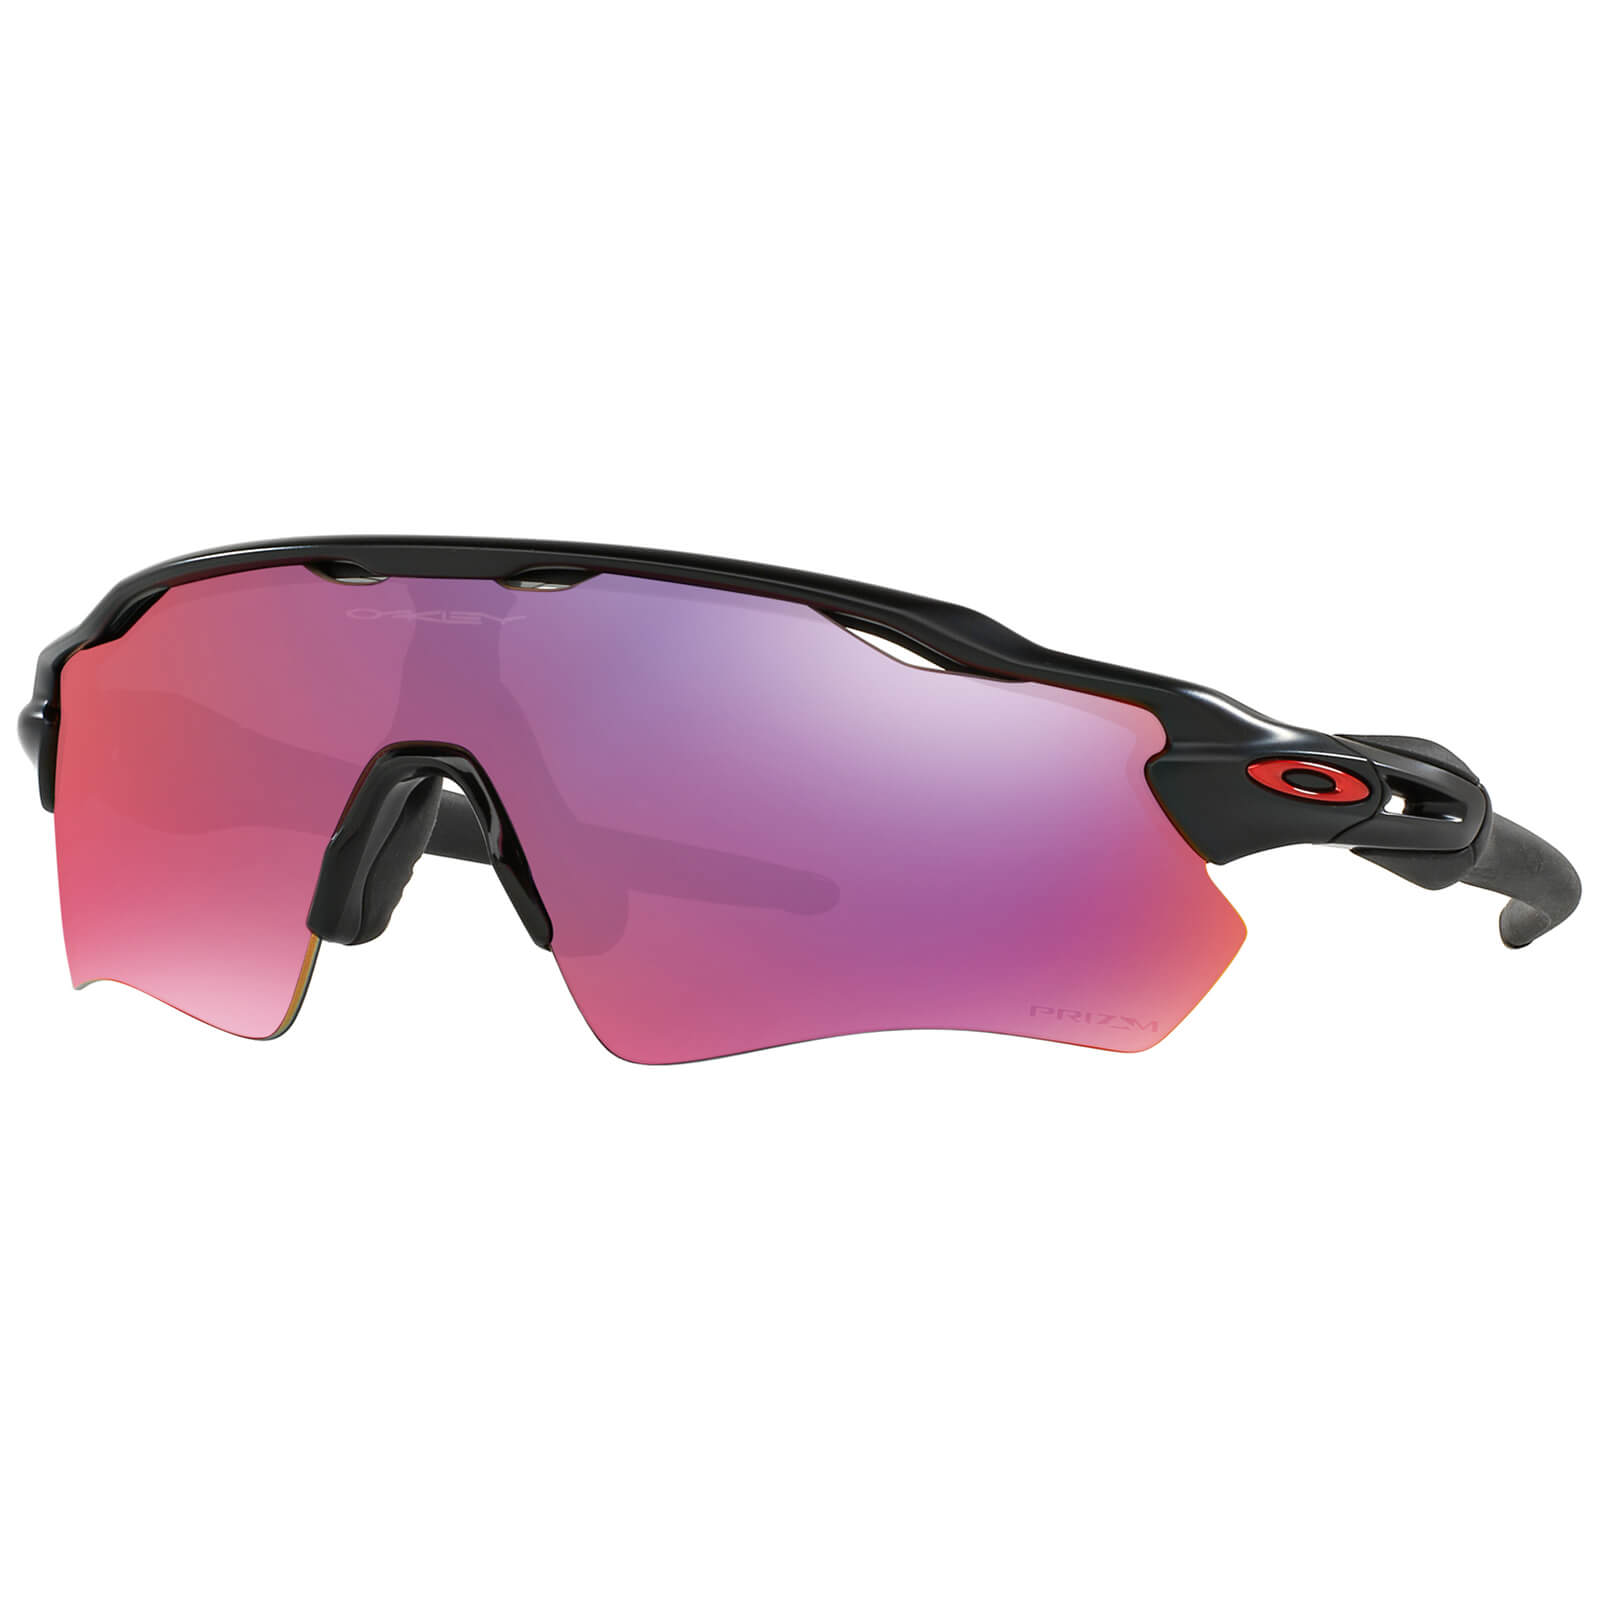 c45eef51f7 Oakley Radar EV Path Sunglasses - Matte Black Prizm Road ...